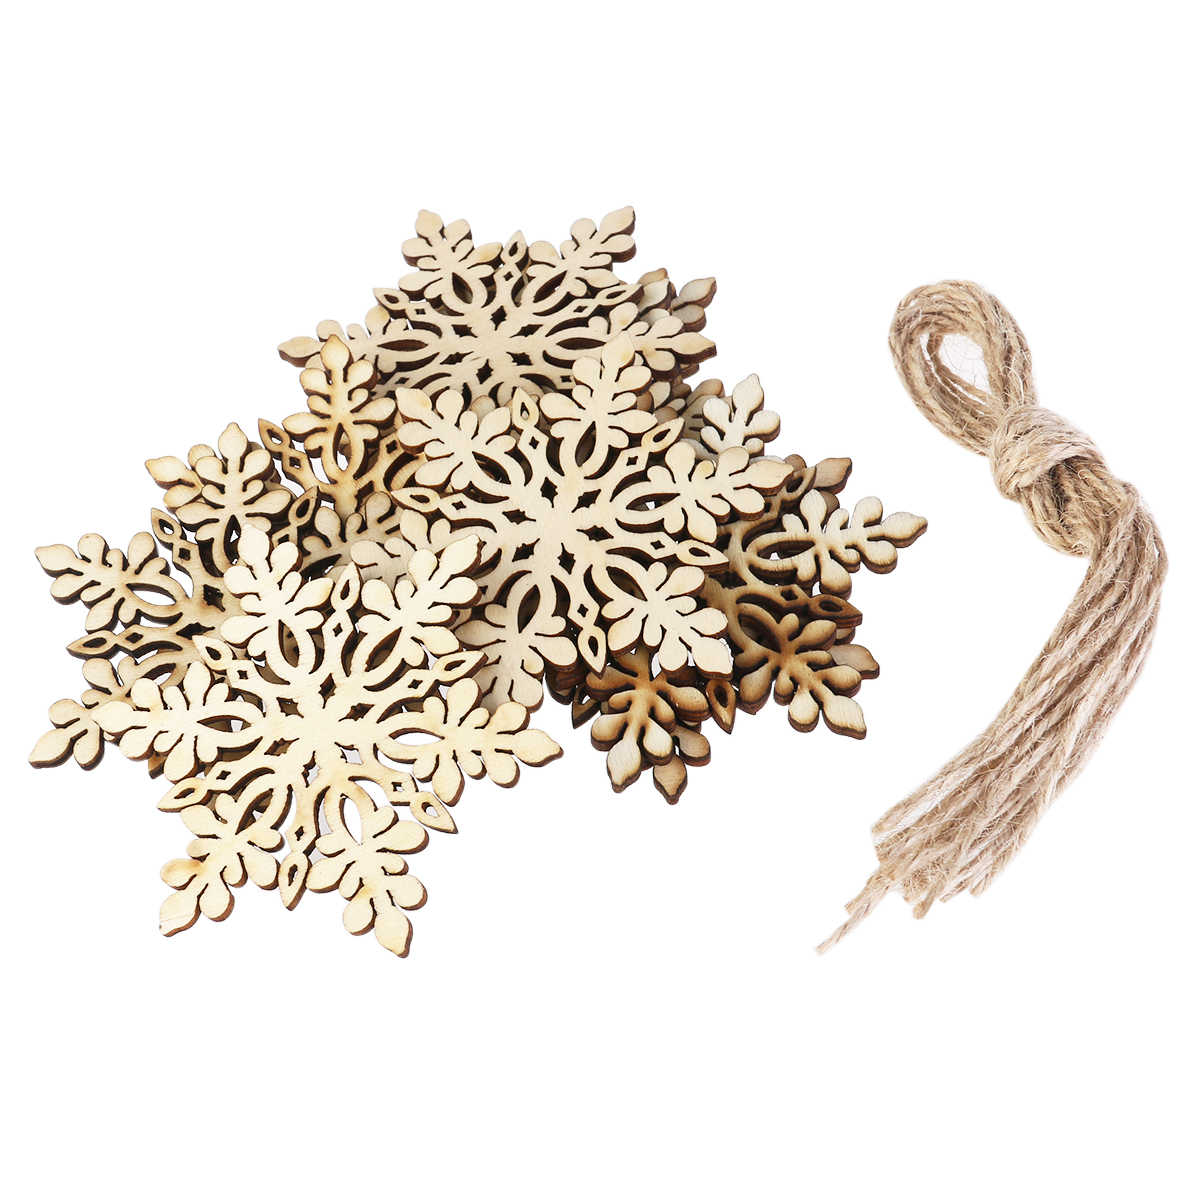 10 pcs Sharp Hexagonal ไม้ Snowflake แขวนเครื่องประดับตกแต่งจี้ String (สีไม้)